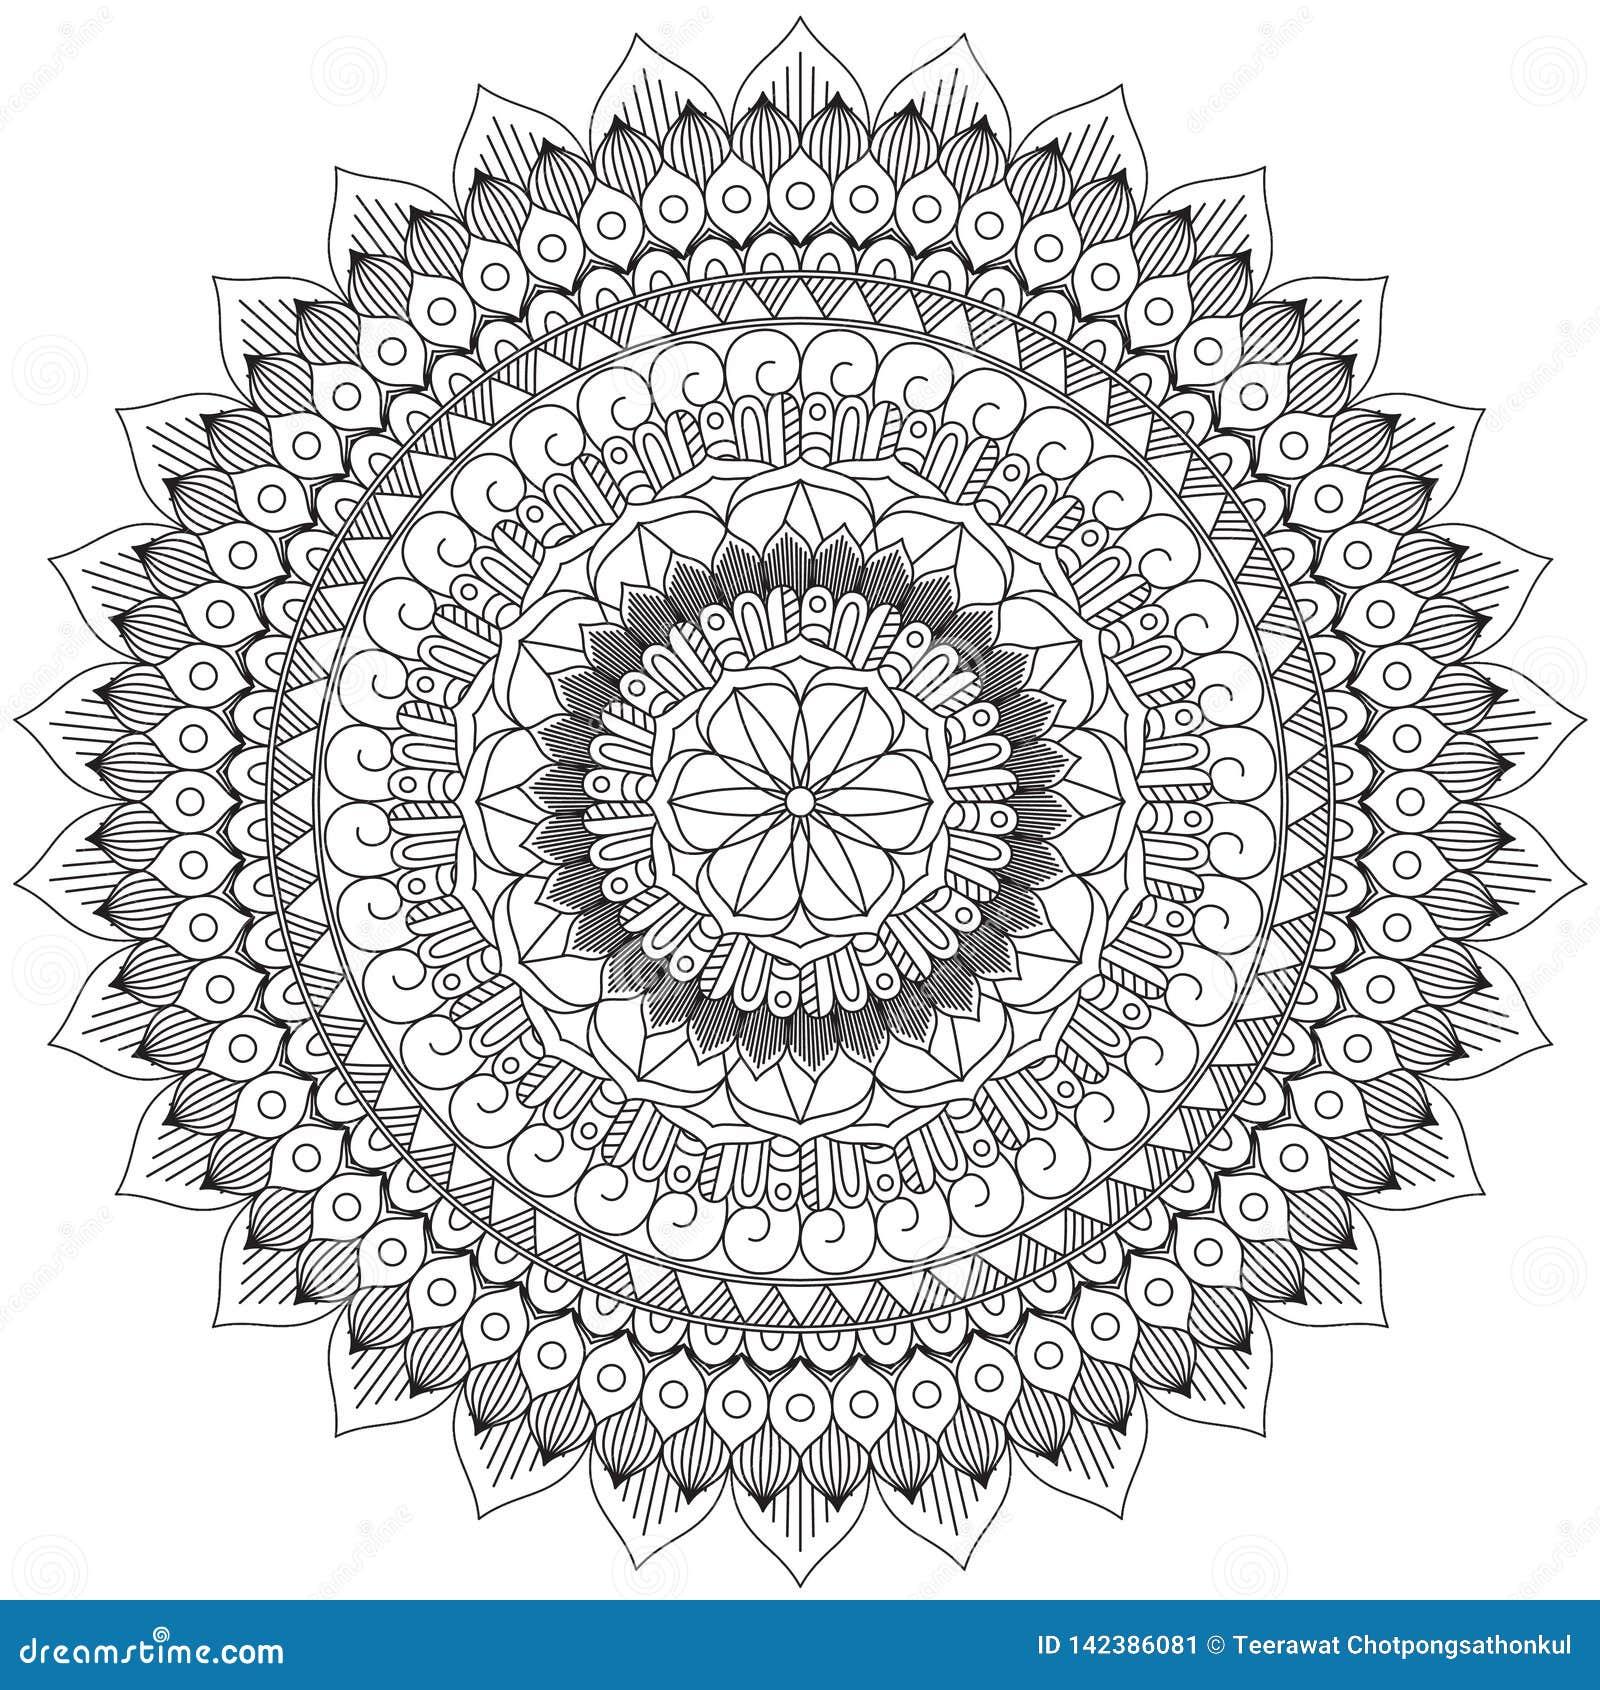 Mandala Intricate Patterns Black and White Good Mood.